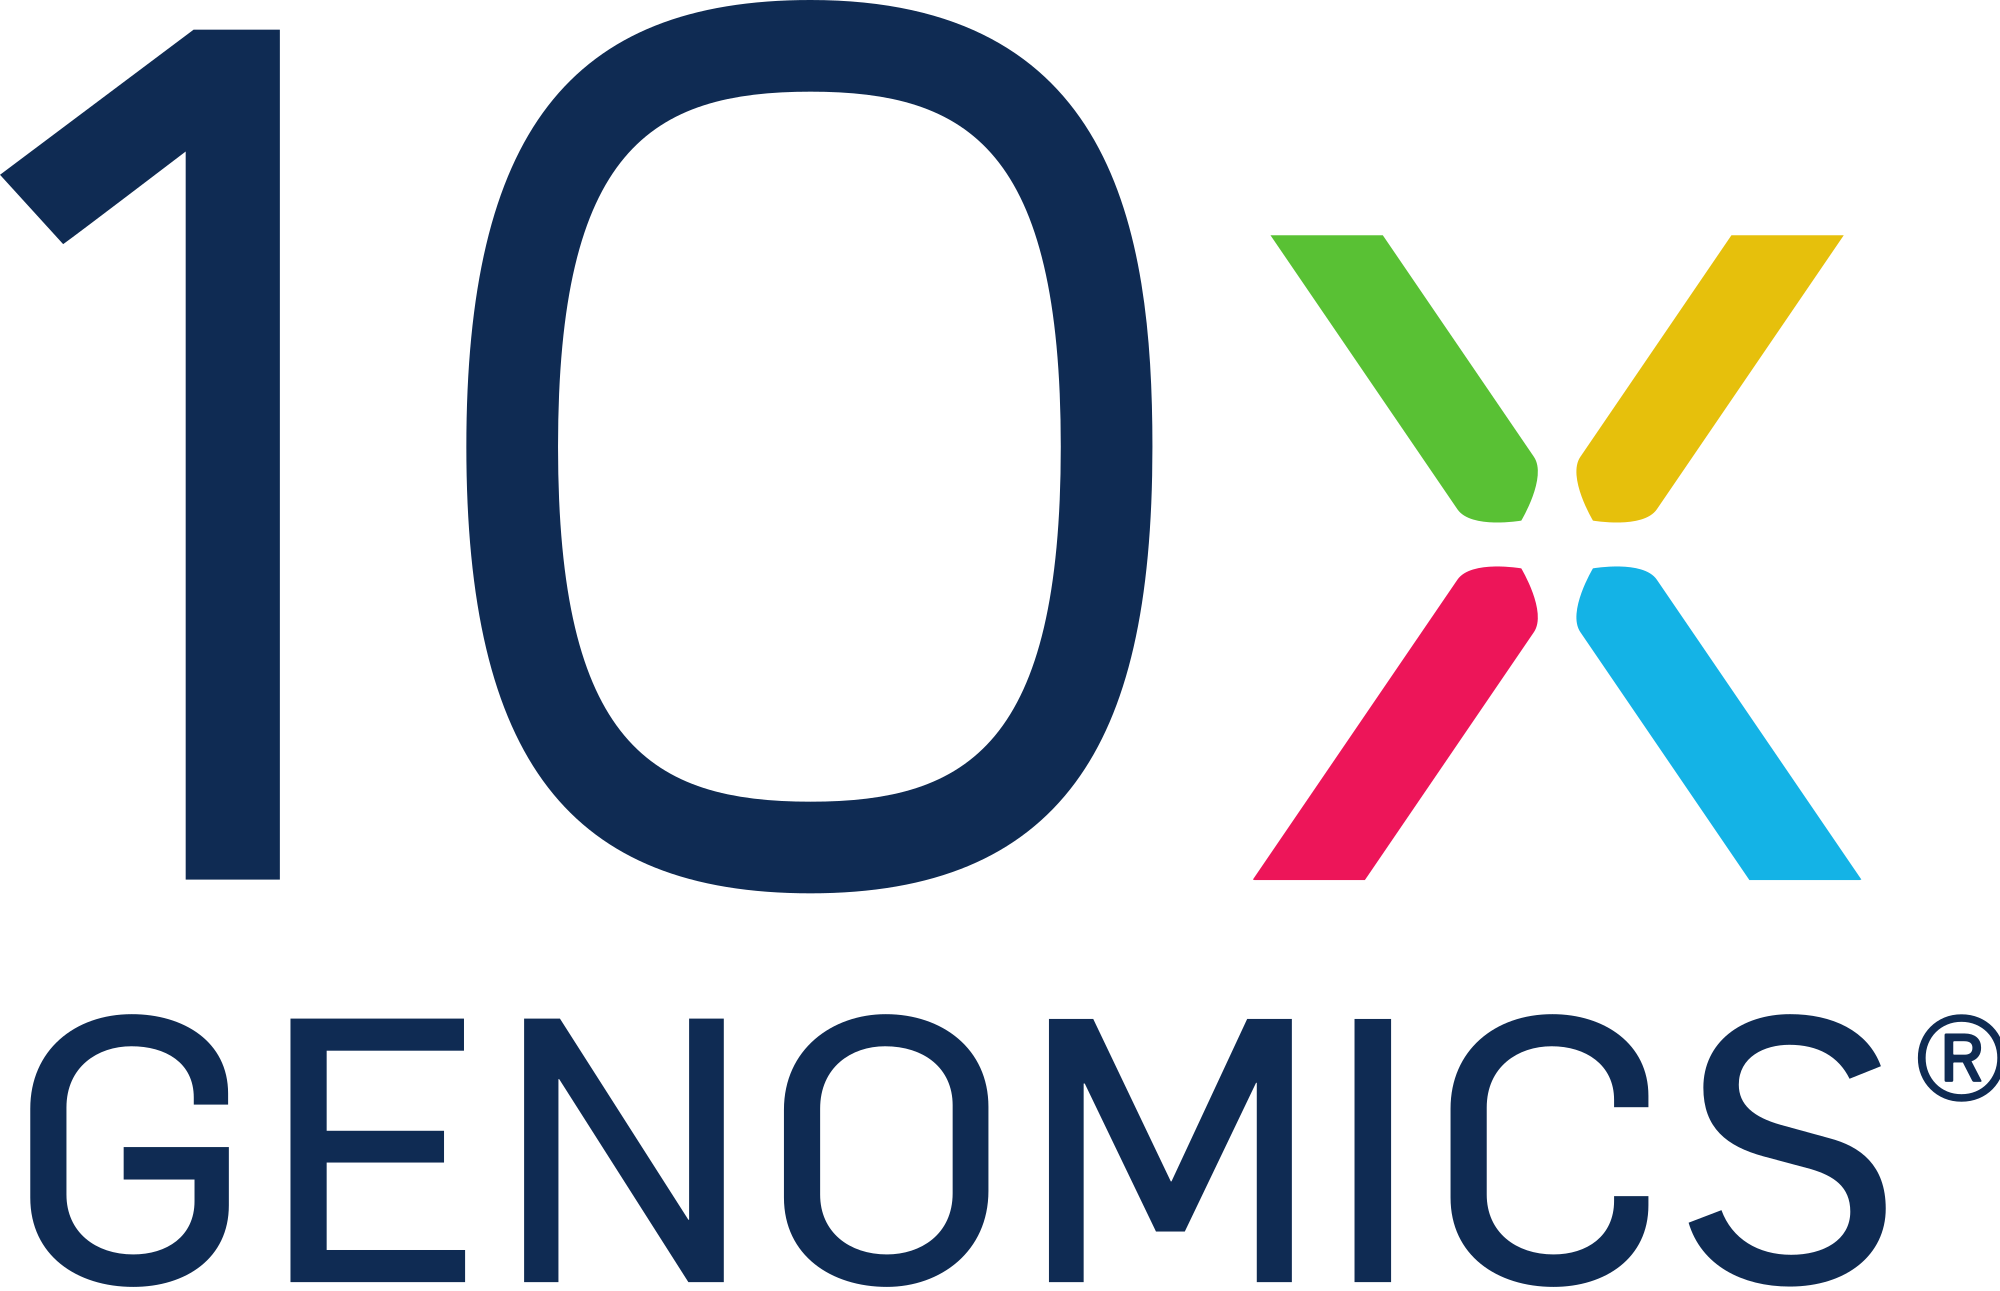 10x_Genomics_logo.svg